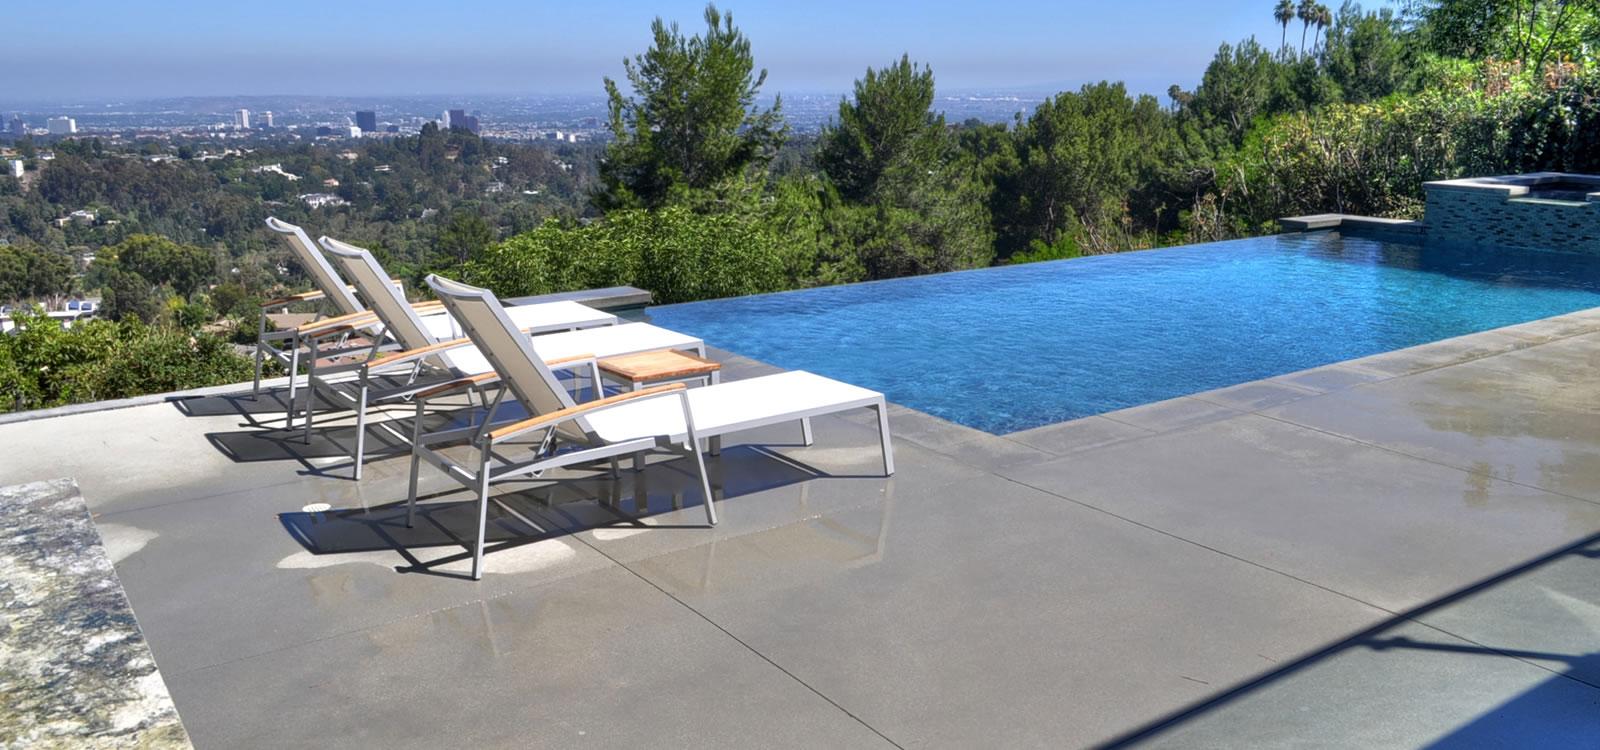 Los angeles vanishing edge pool design w elevated spa custom tile by john crystal pools los for Swimming pool demolition los angeles